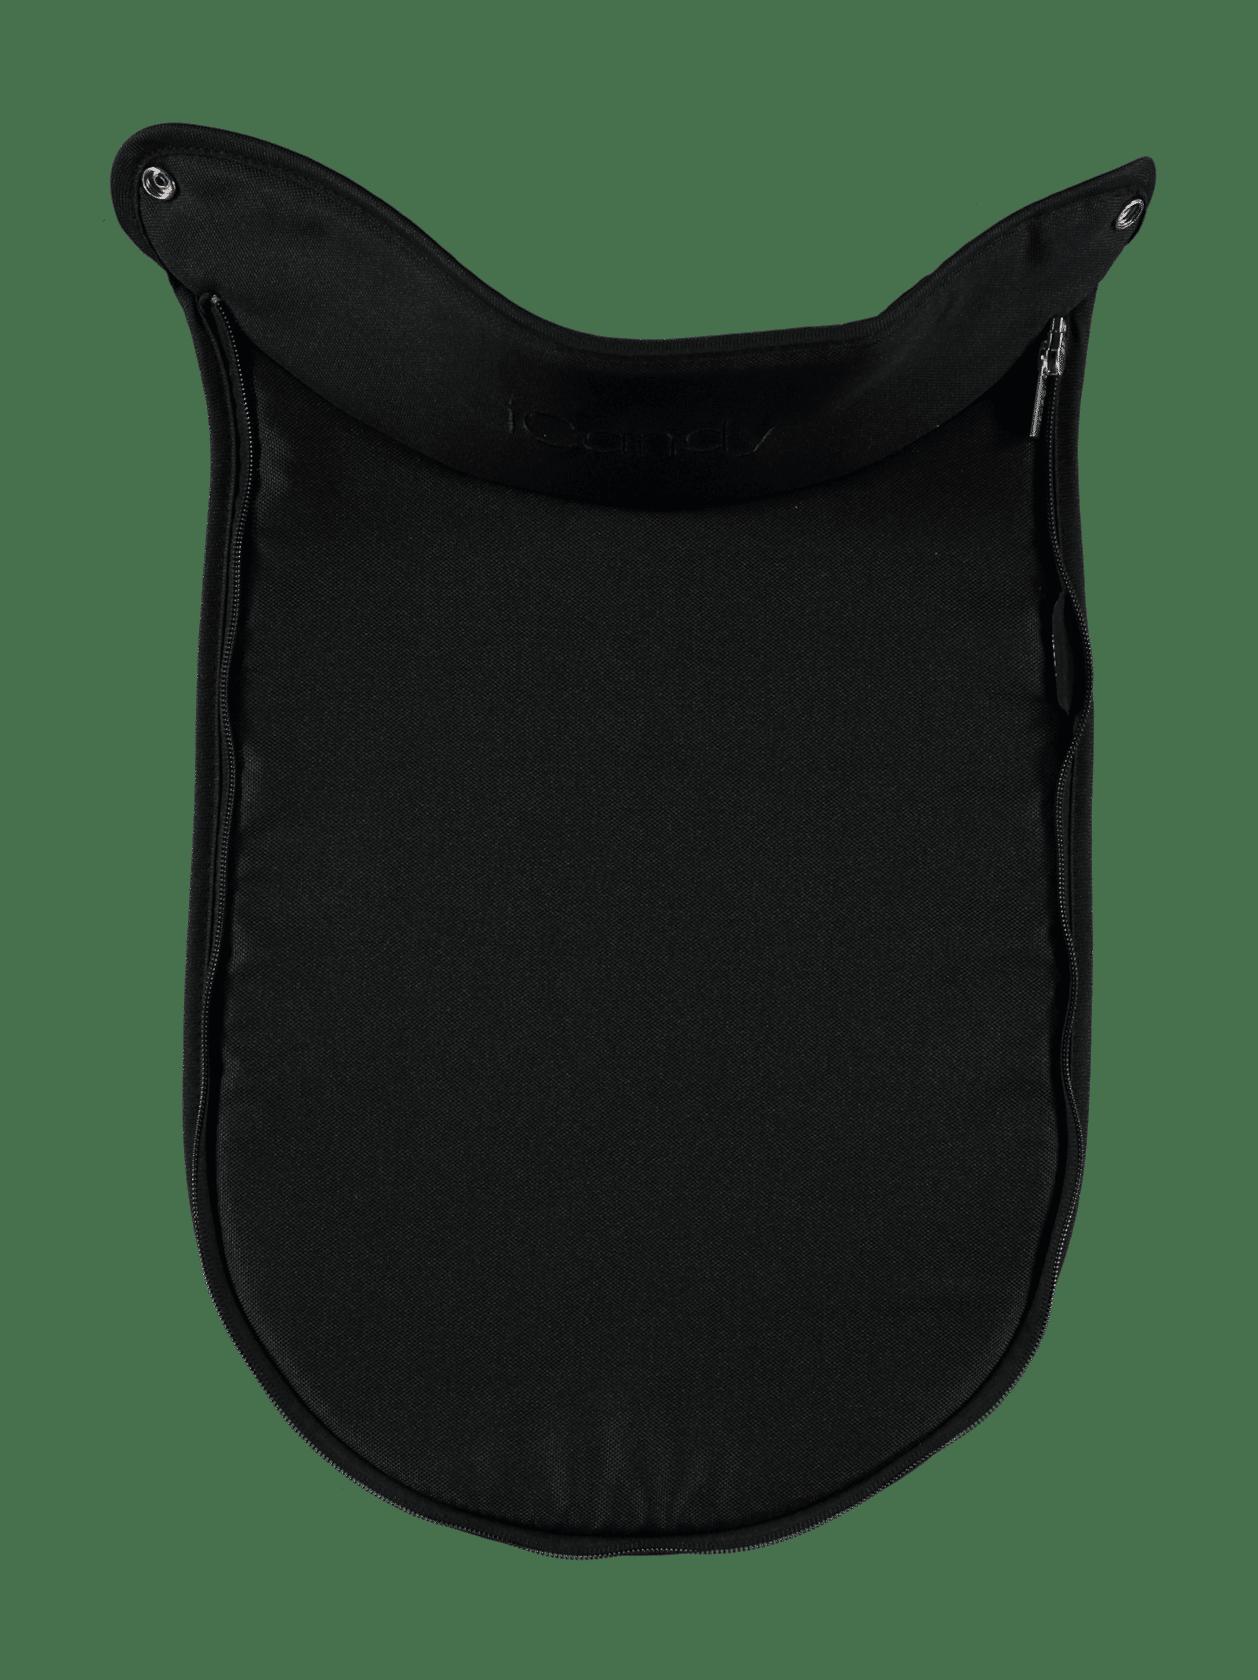 Black Magic Carrycot Apron